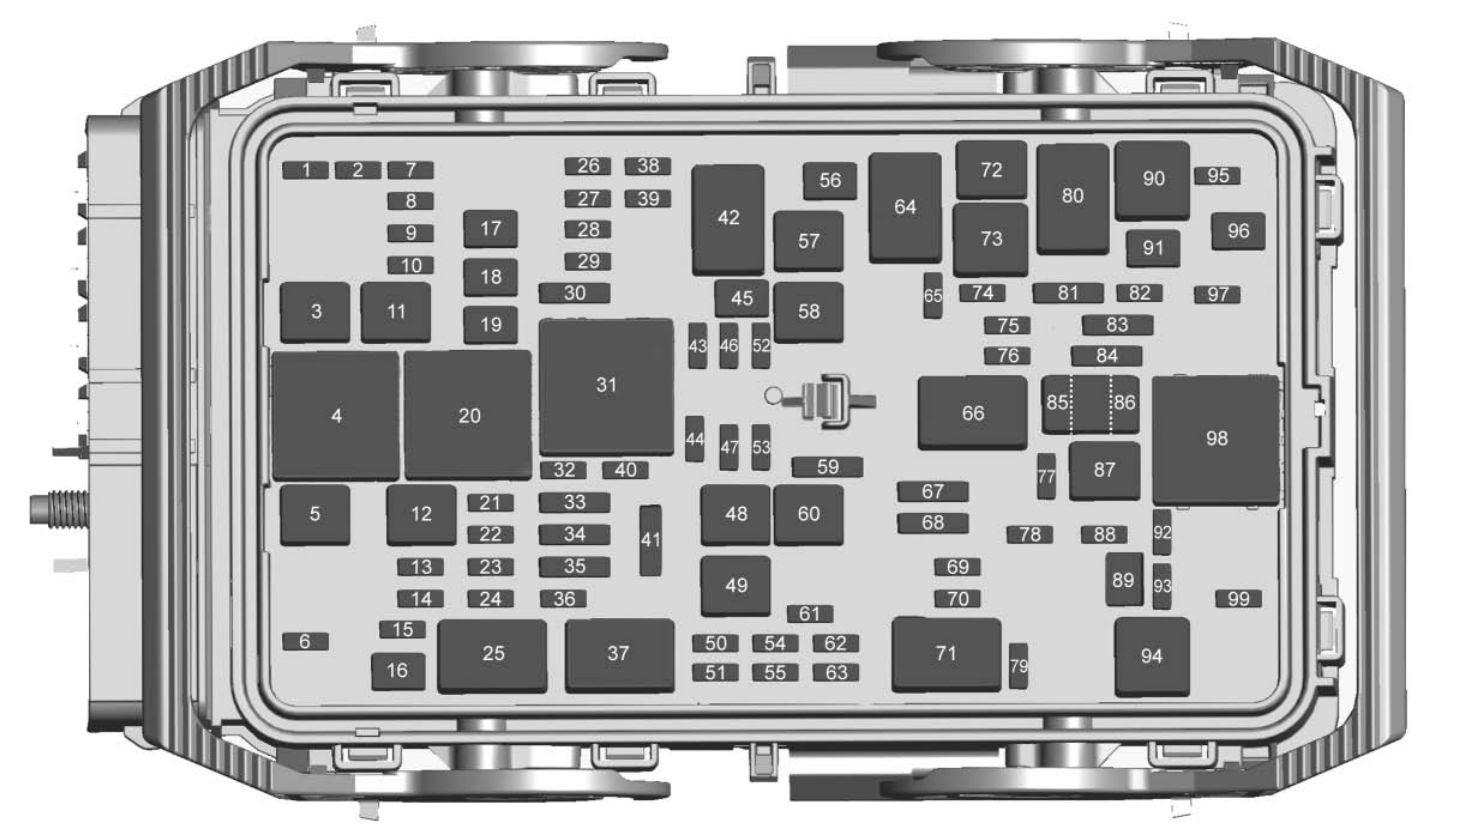 2014 Chevy Malibu Interior Diagram.html